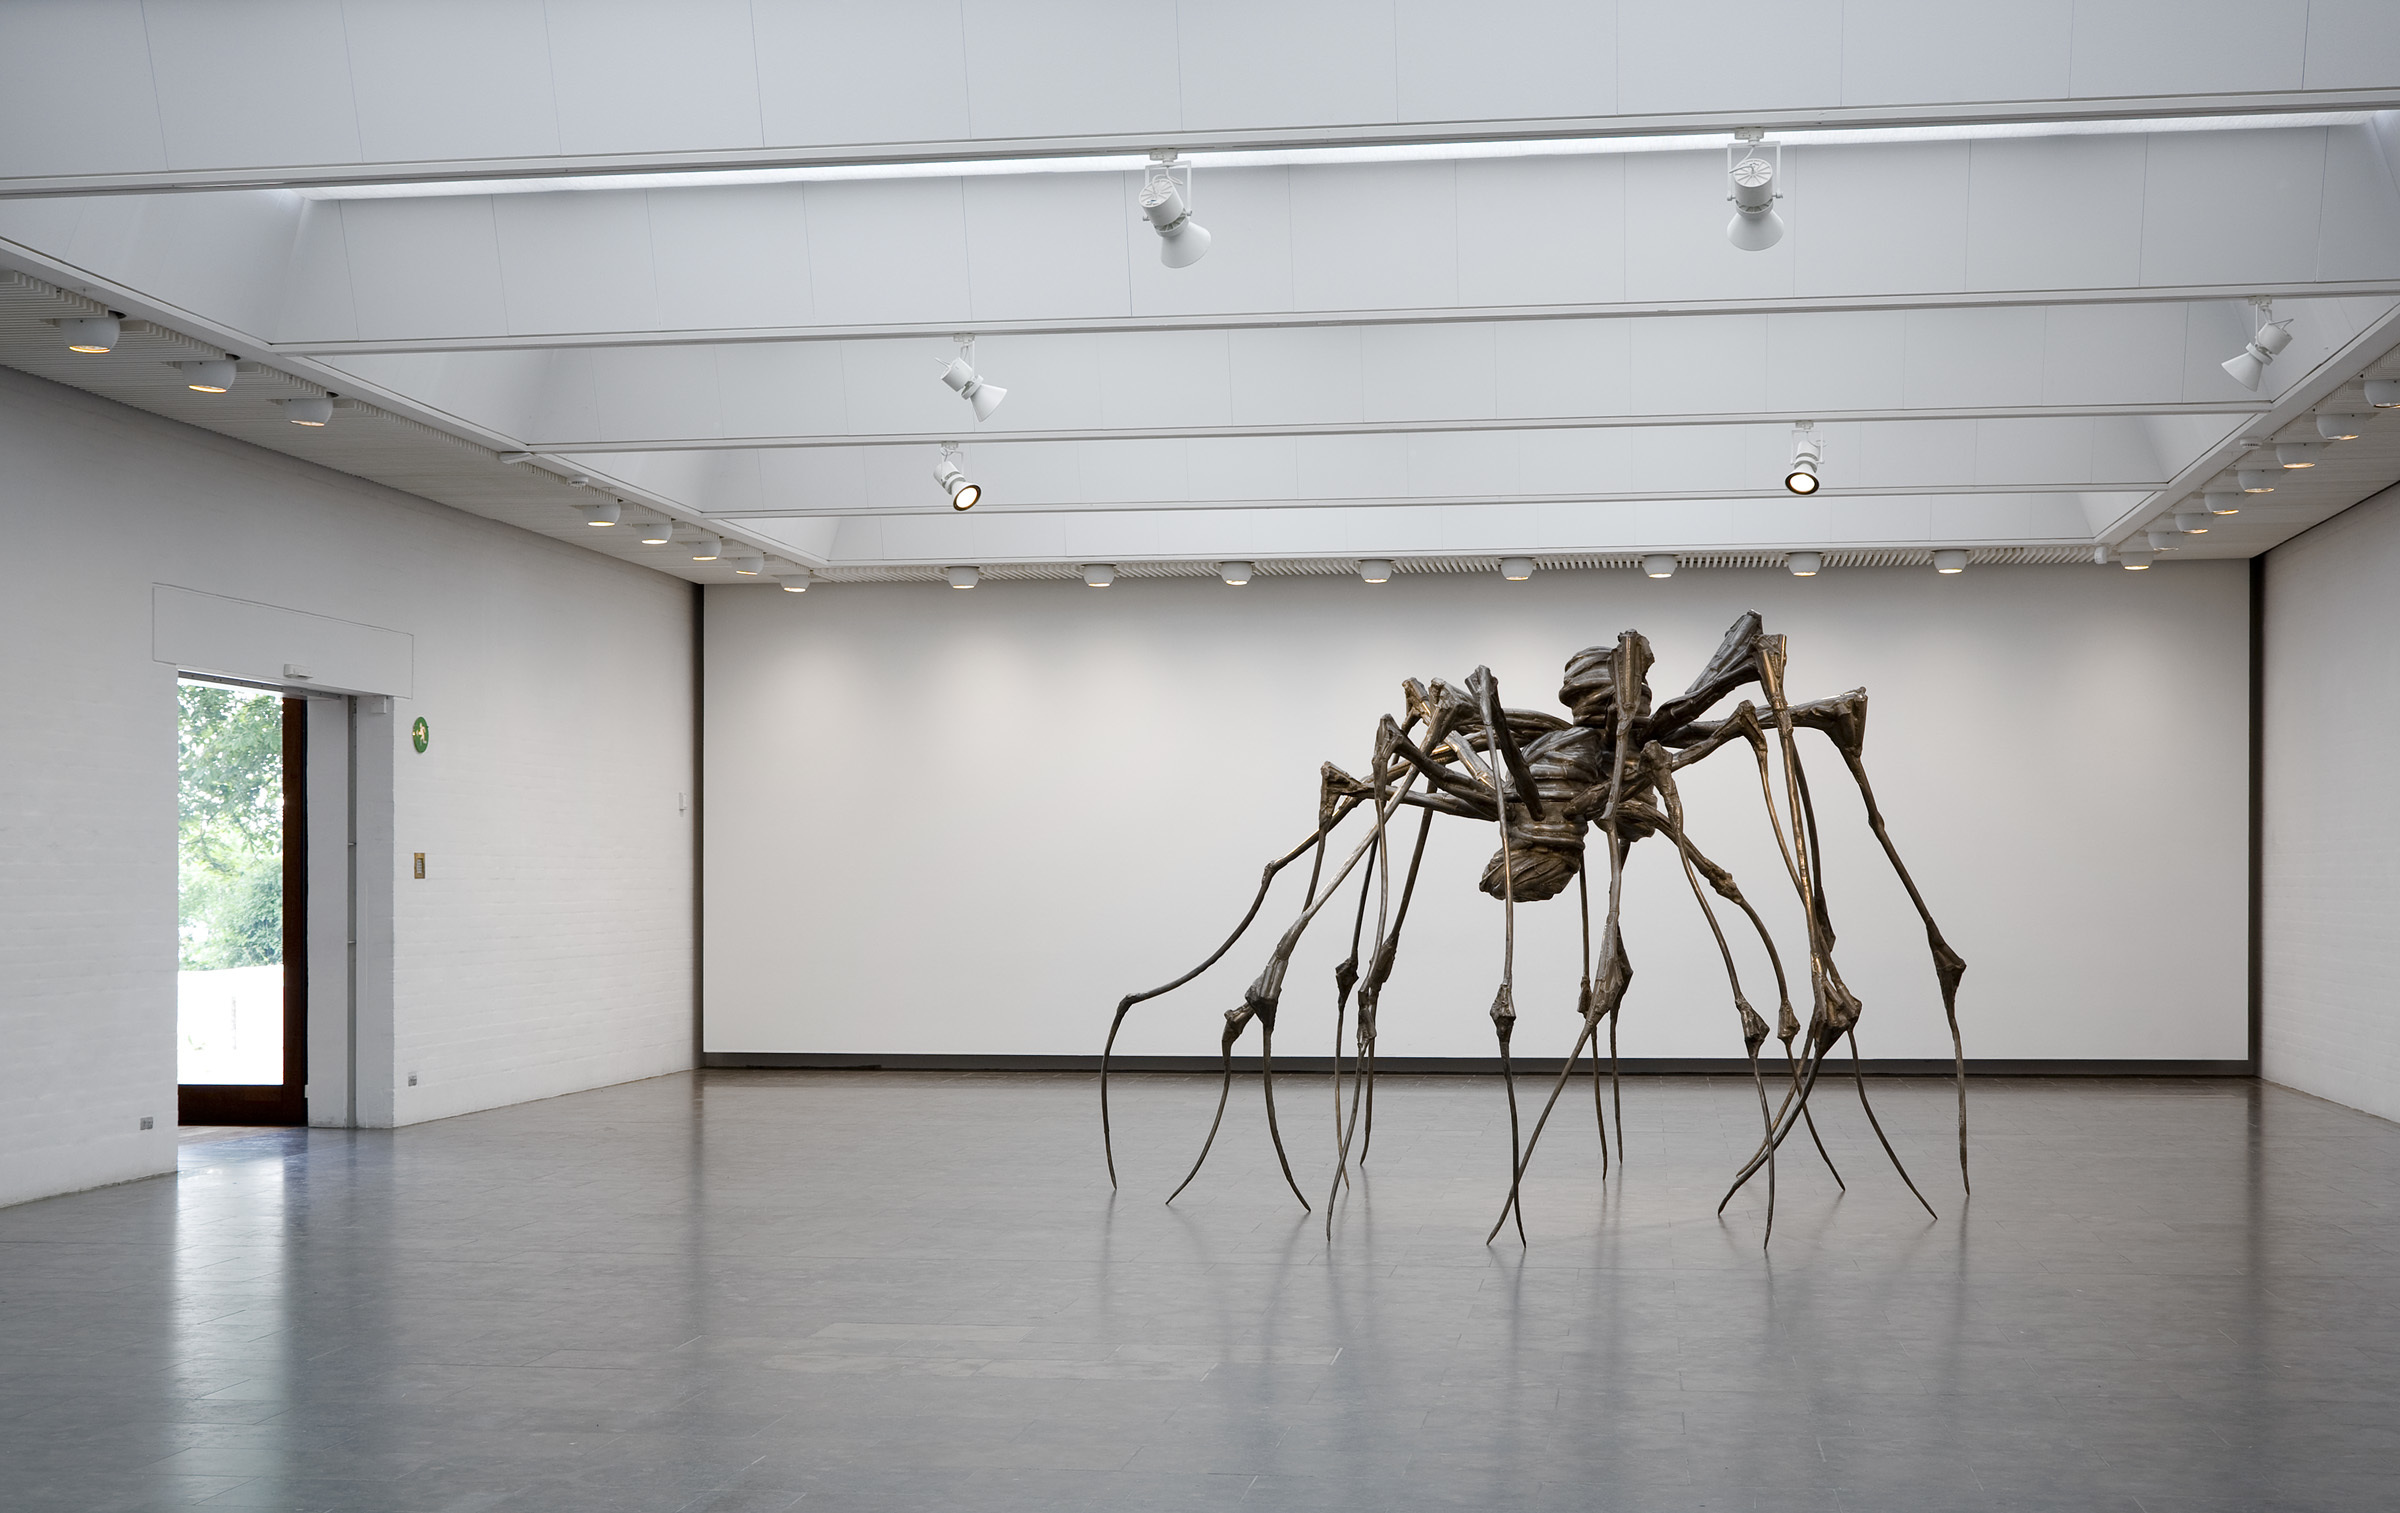 Gigantiske edderkopper flytter ind på Kunsten